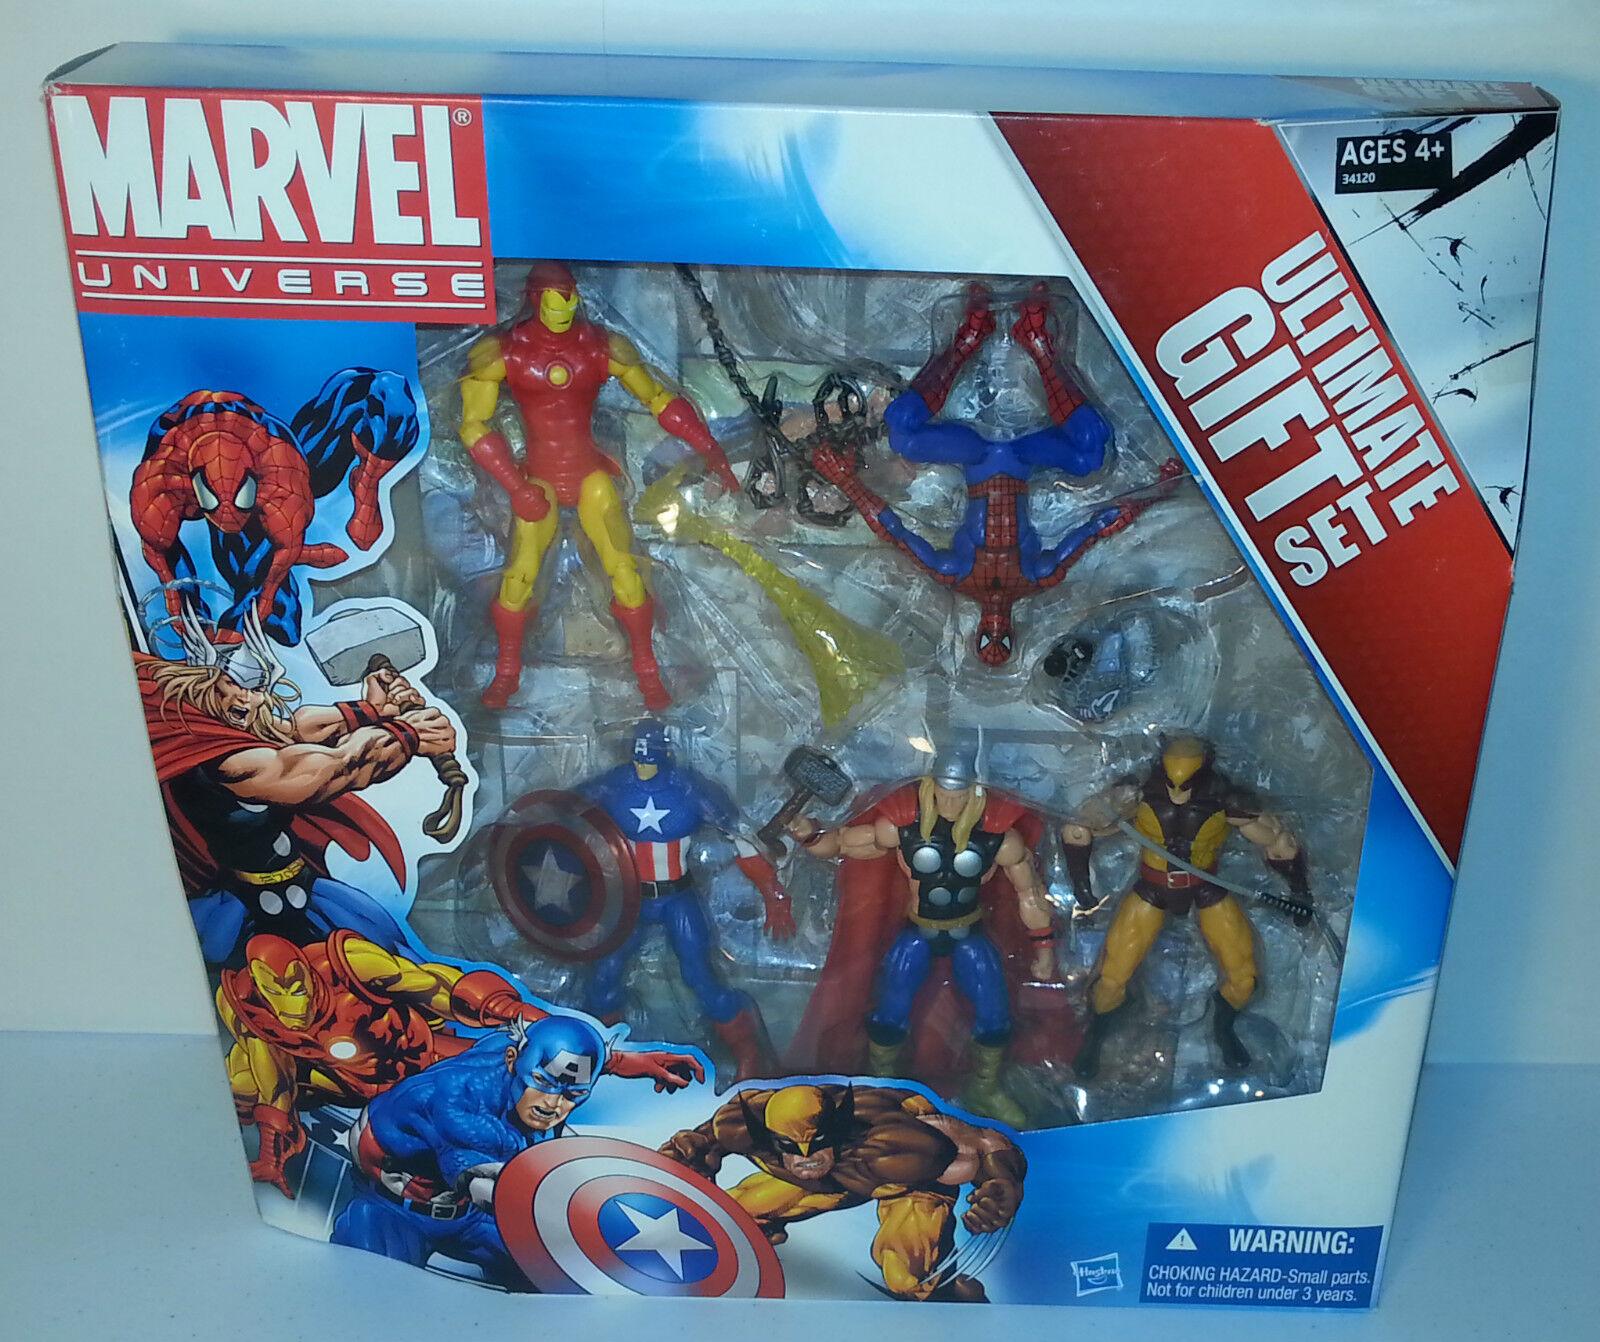 MARVEL UNIVERSE ULTIMATE GIFT 5-PACK BOX SET IRON SPIDER-MAN WOLVERINE THOR CAPT